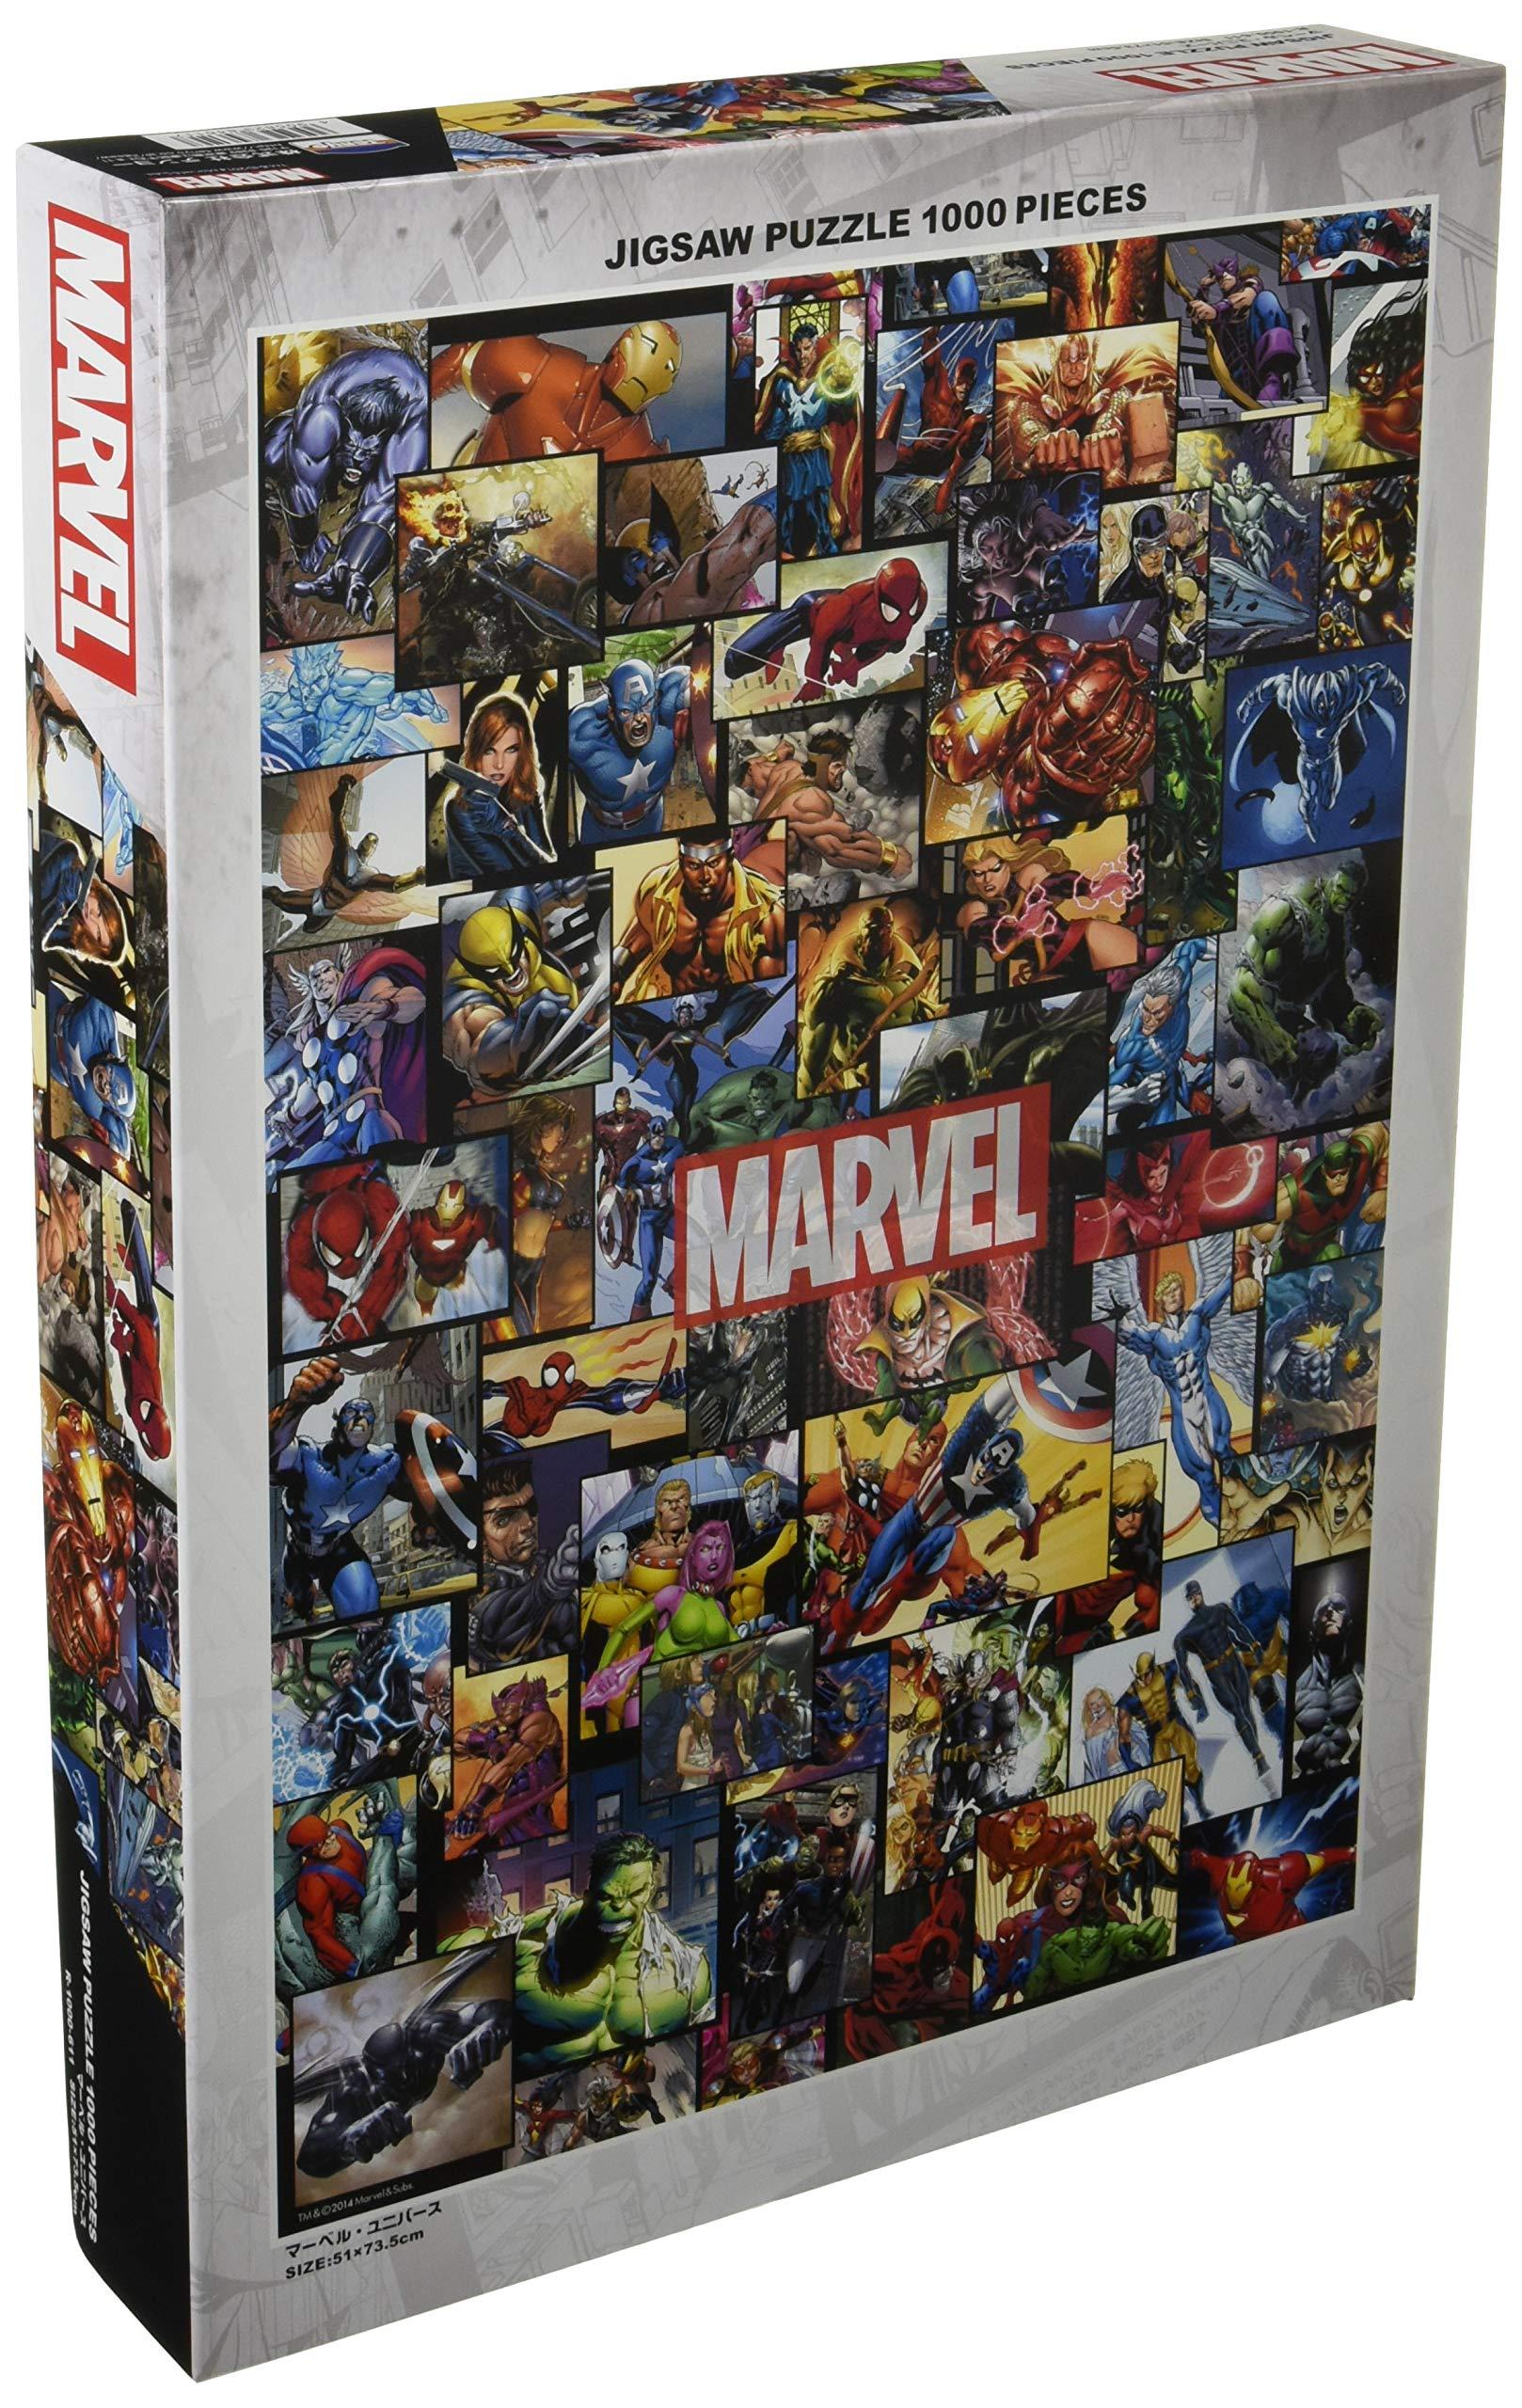 Marvel 1000 Piece Marvel Universe R-1000-611